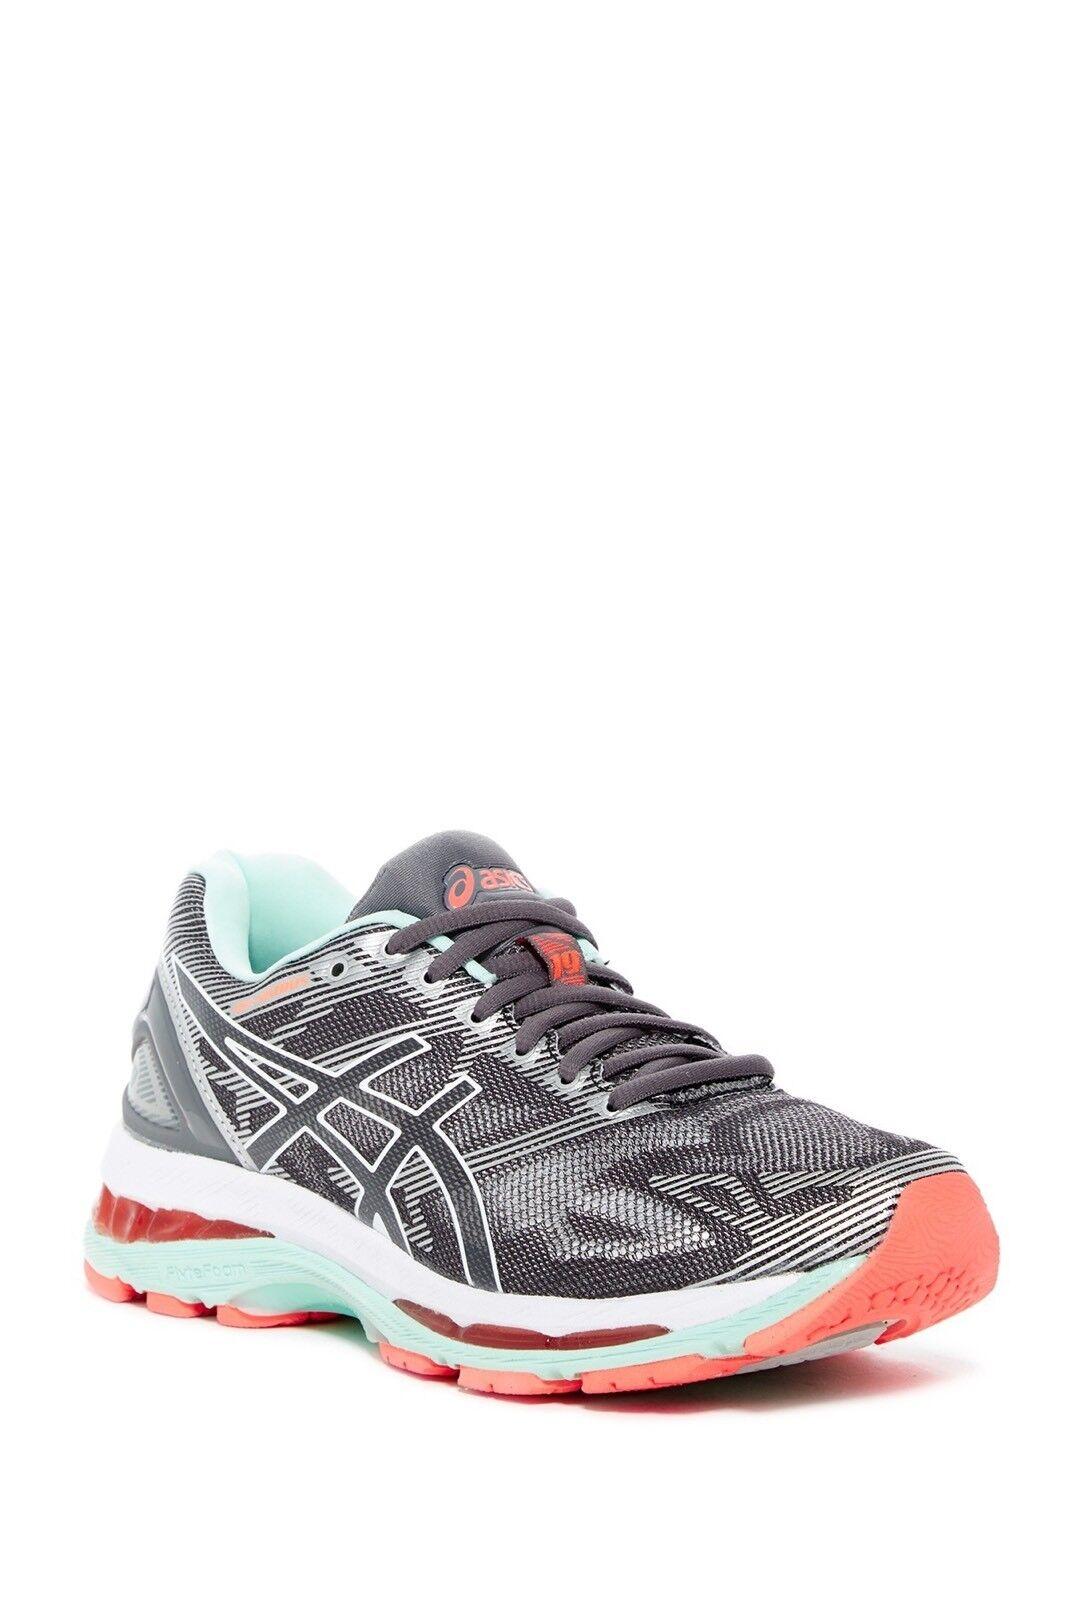 $160 NEW ASICS Gel-Nimbus 19 Carbon White/Flash Coral Train Running Shoe Sz 12N